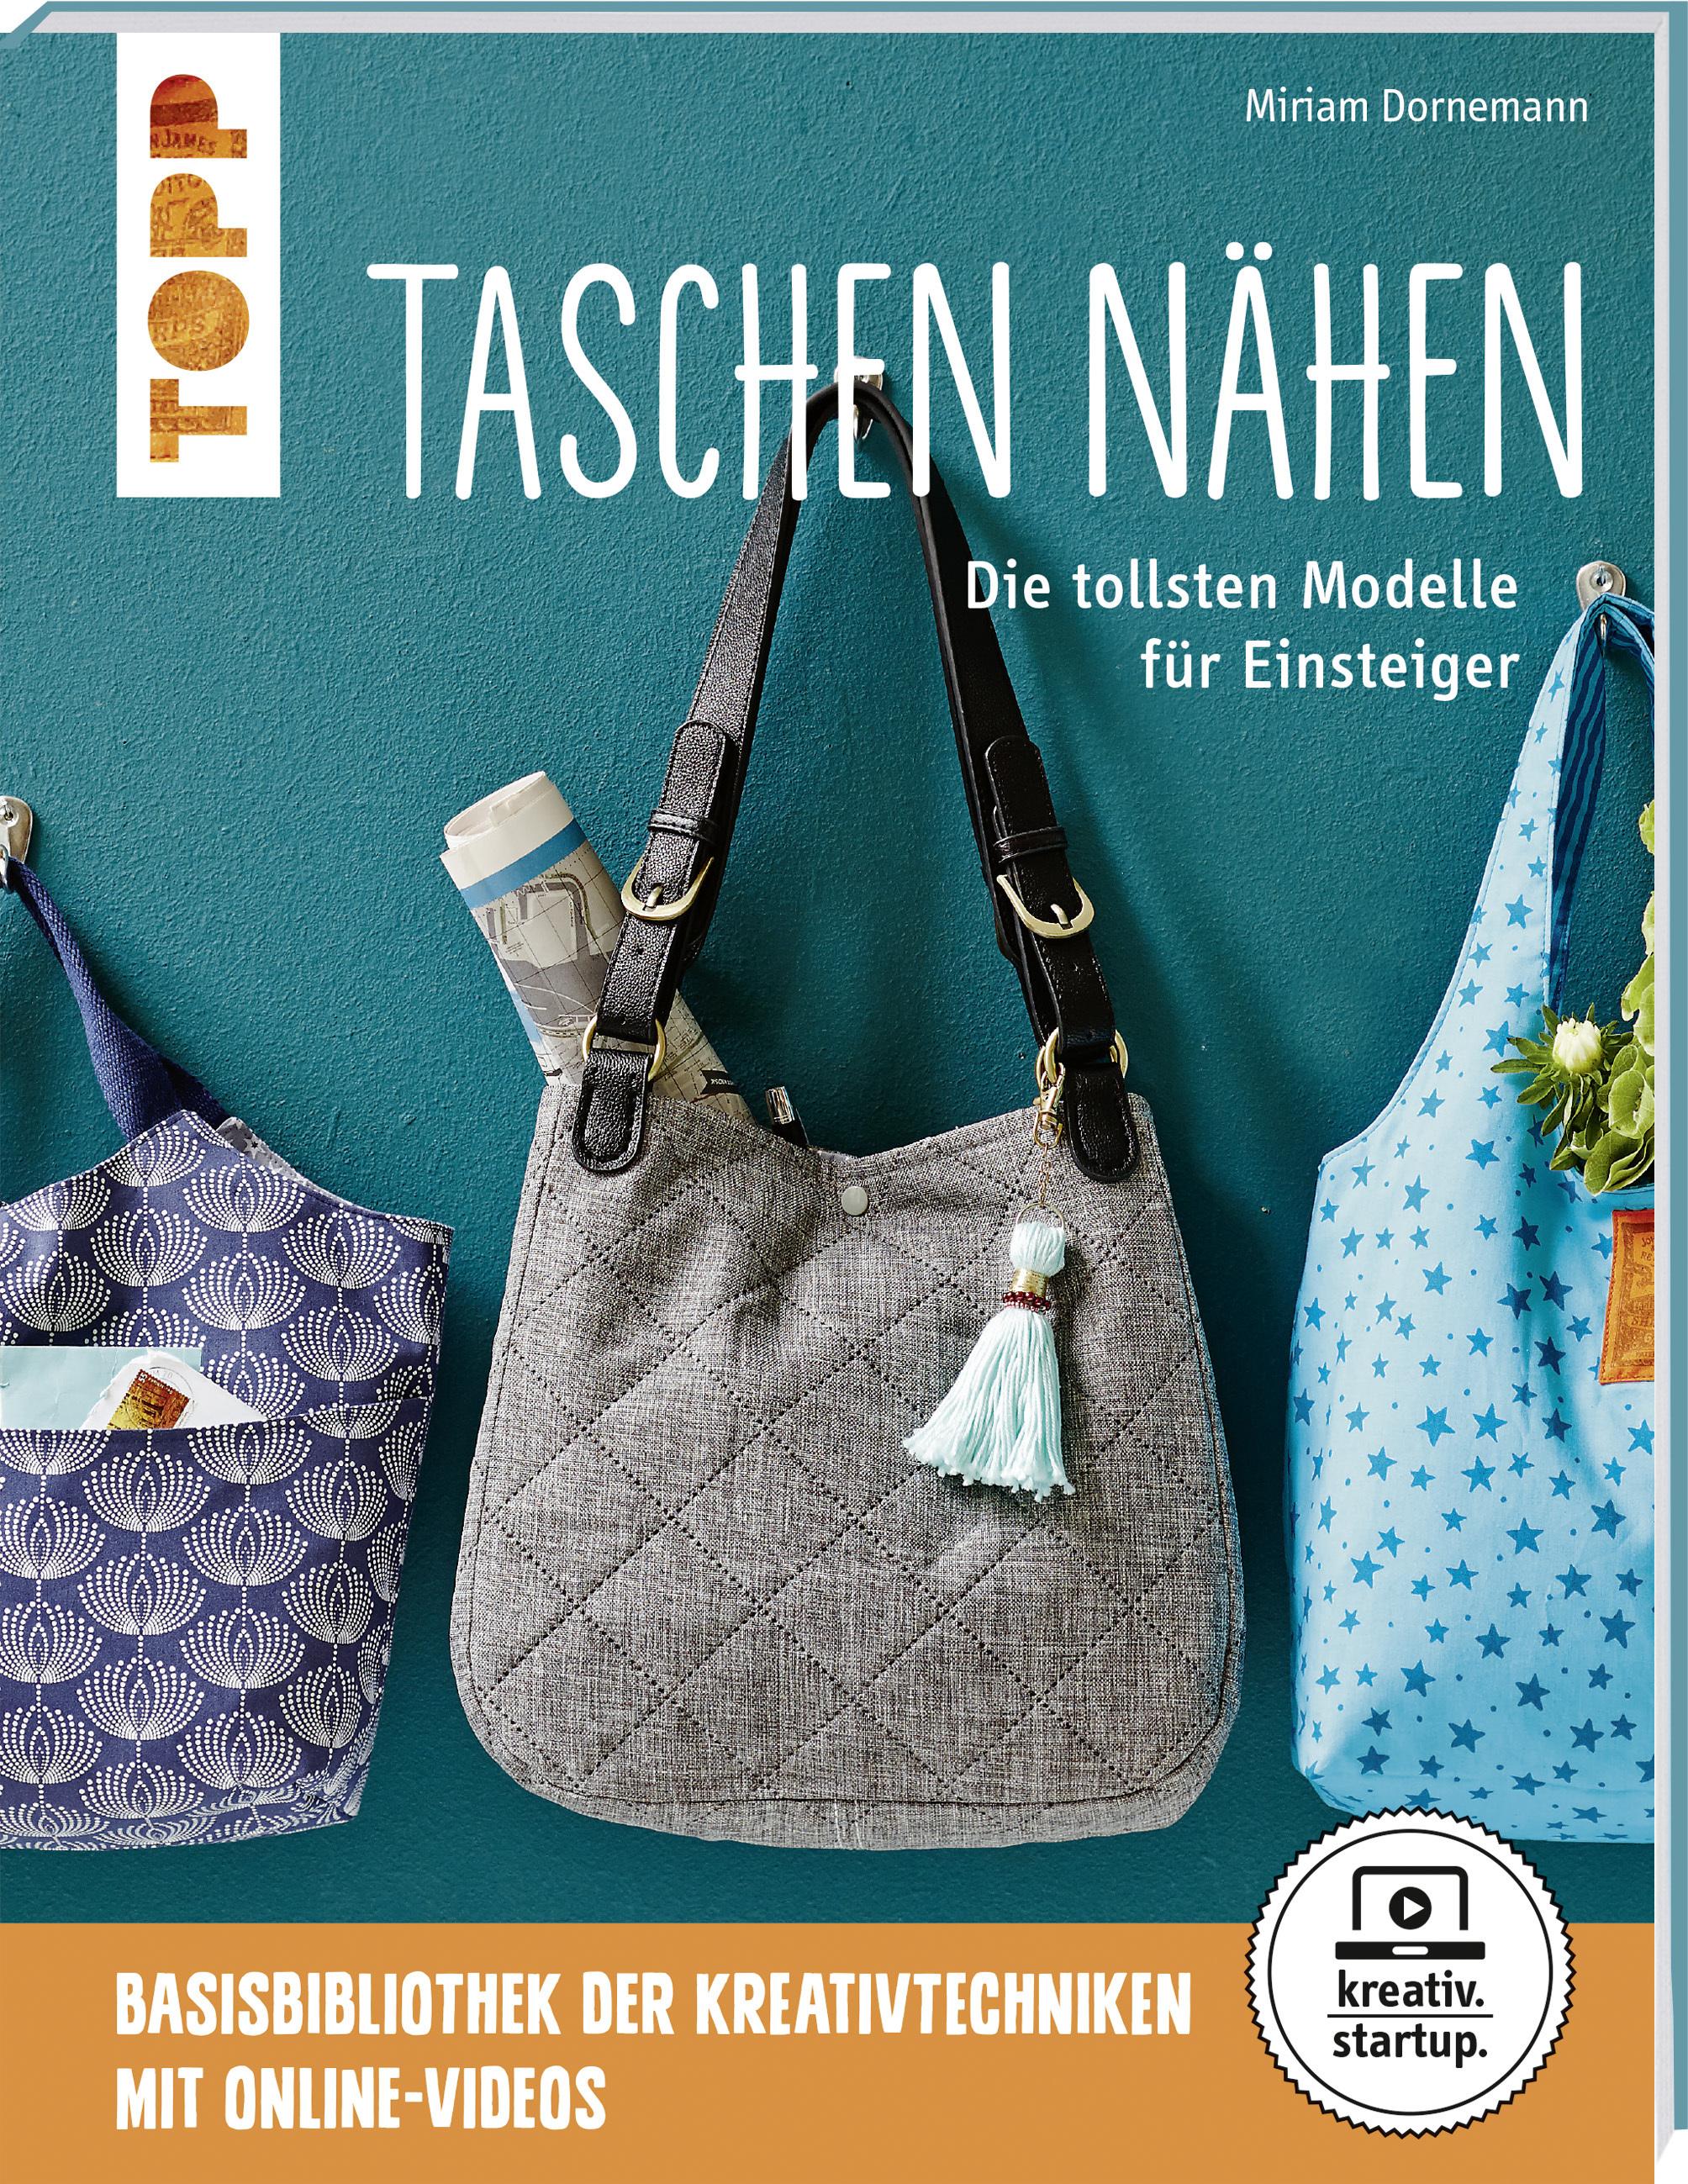 Nähenkreativ Nähenkreativ startup Taschen Nähenkreativ Taschen startup Taschen Nähenkreativ Taschen startup Acj435RLq